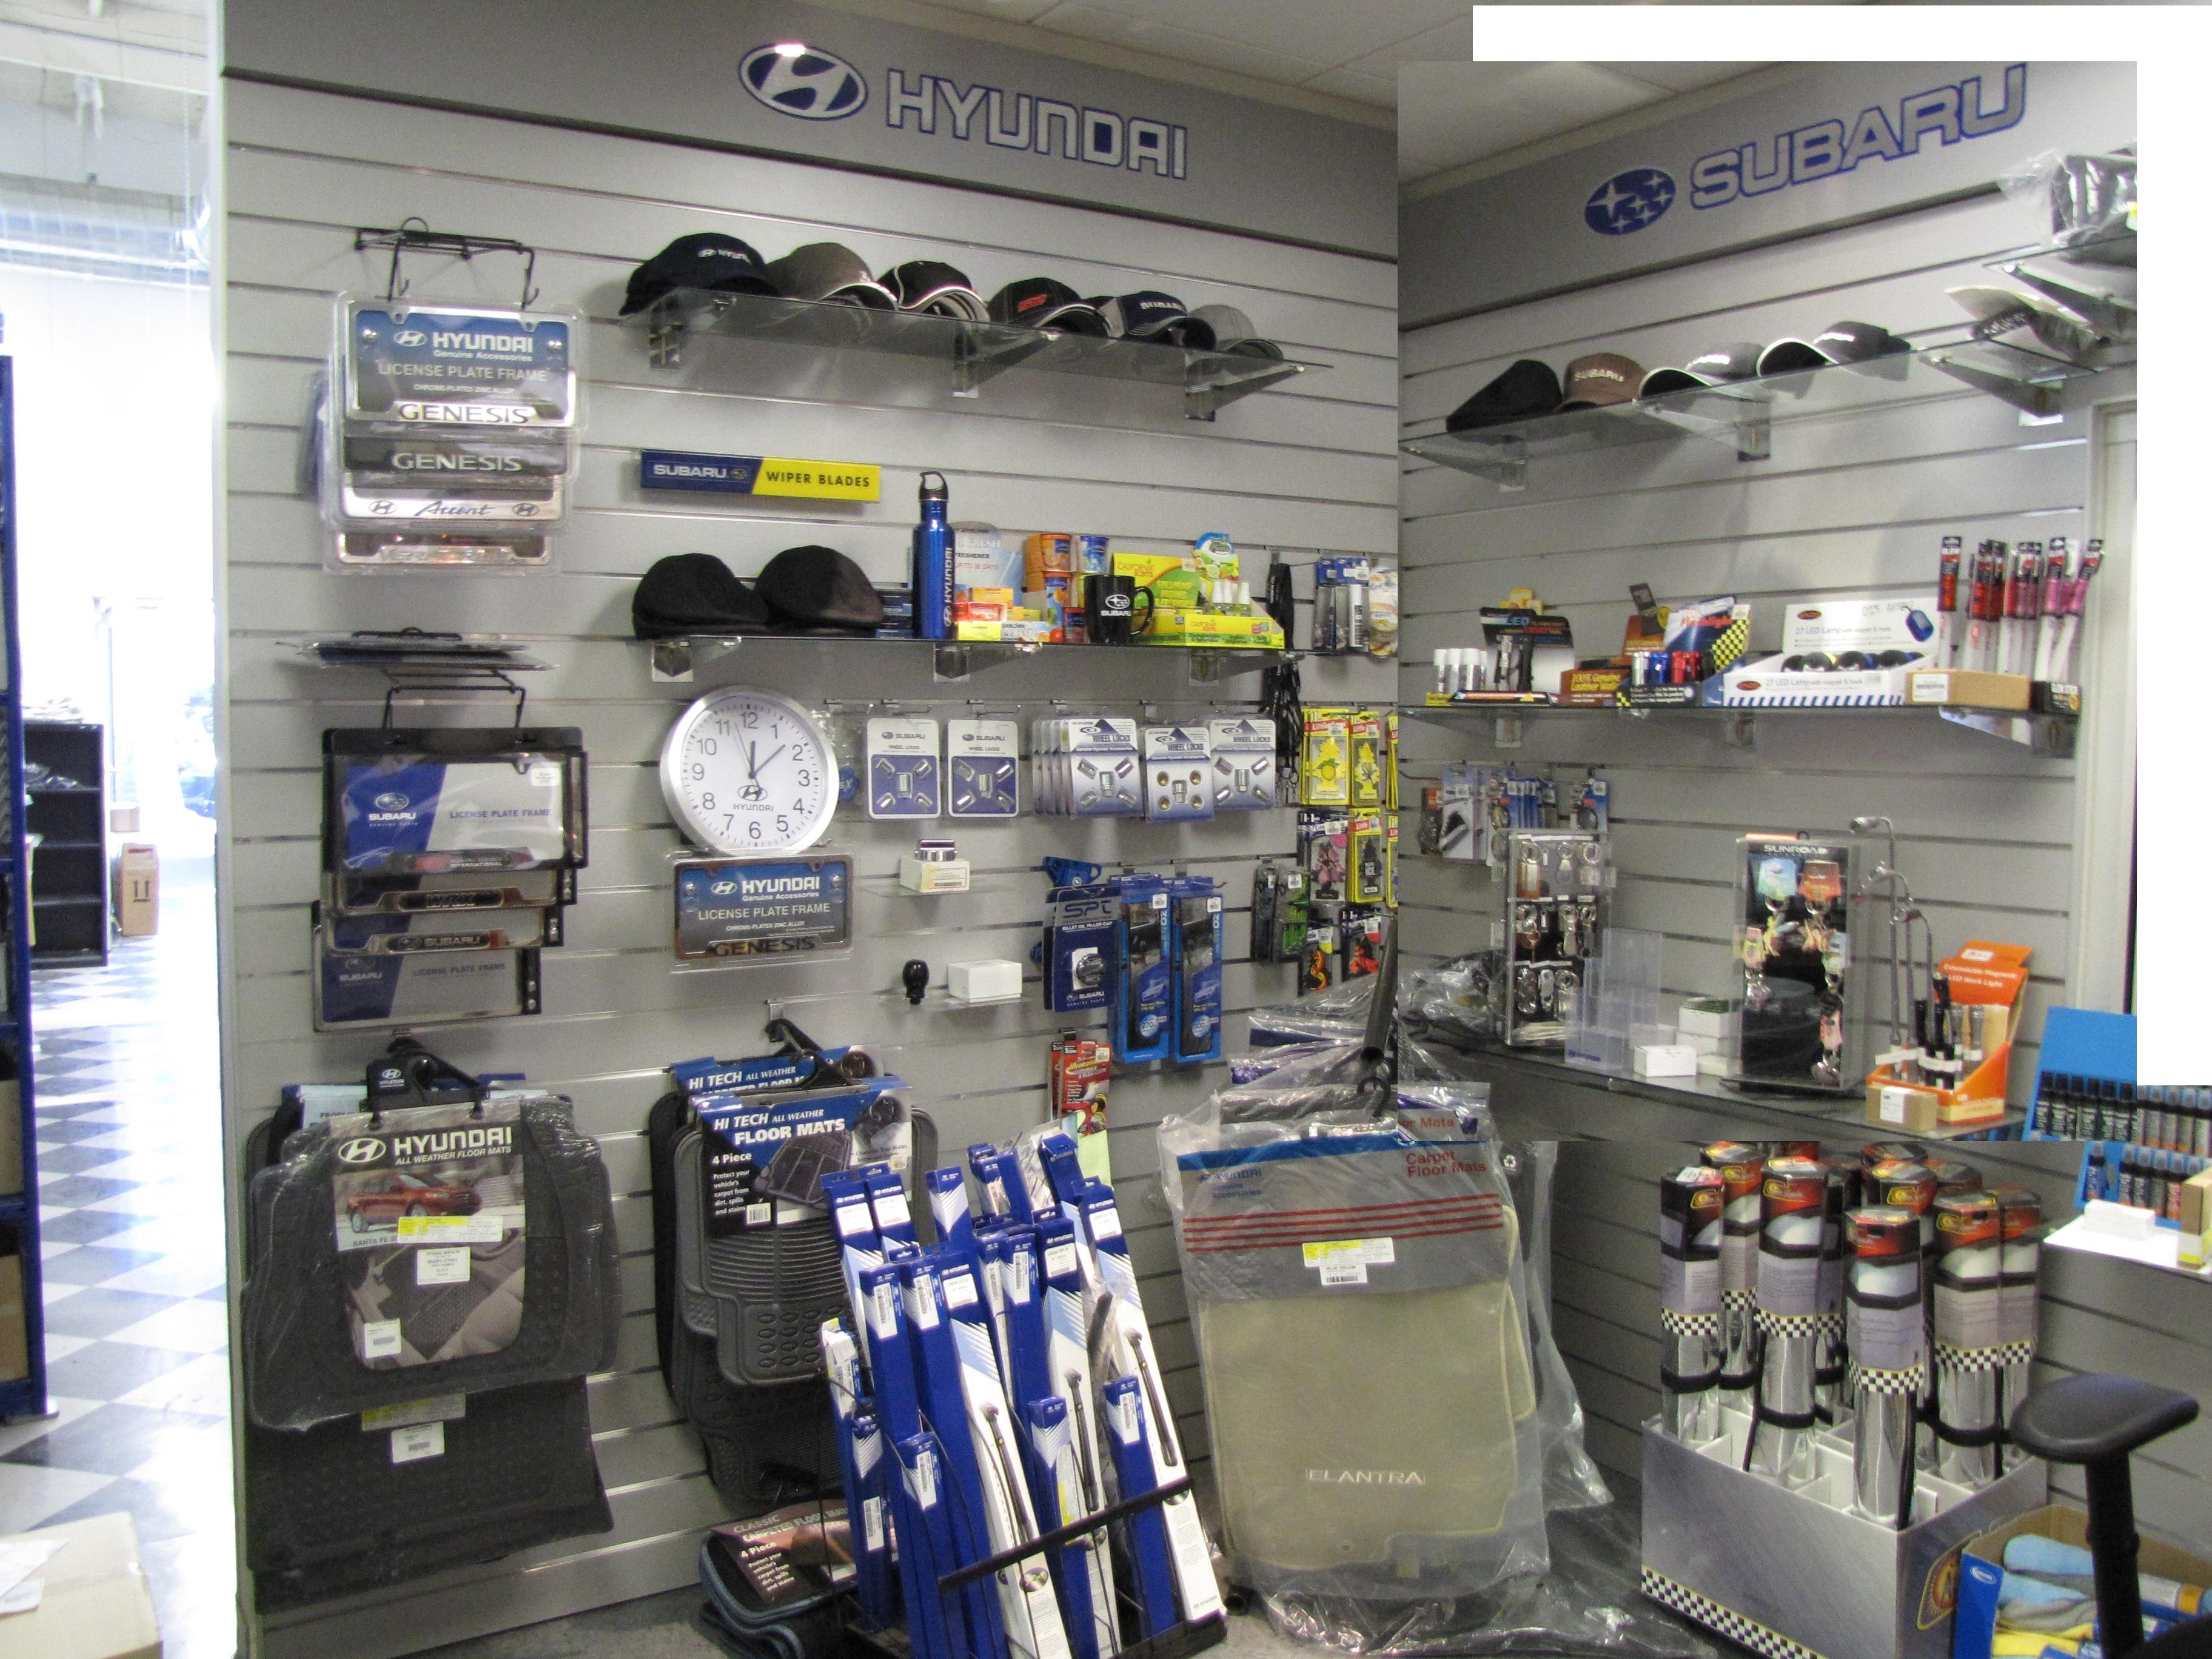 Hyundai & Subaru Accessories in stock at Kearny Mesa Subaru in San Diego